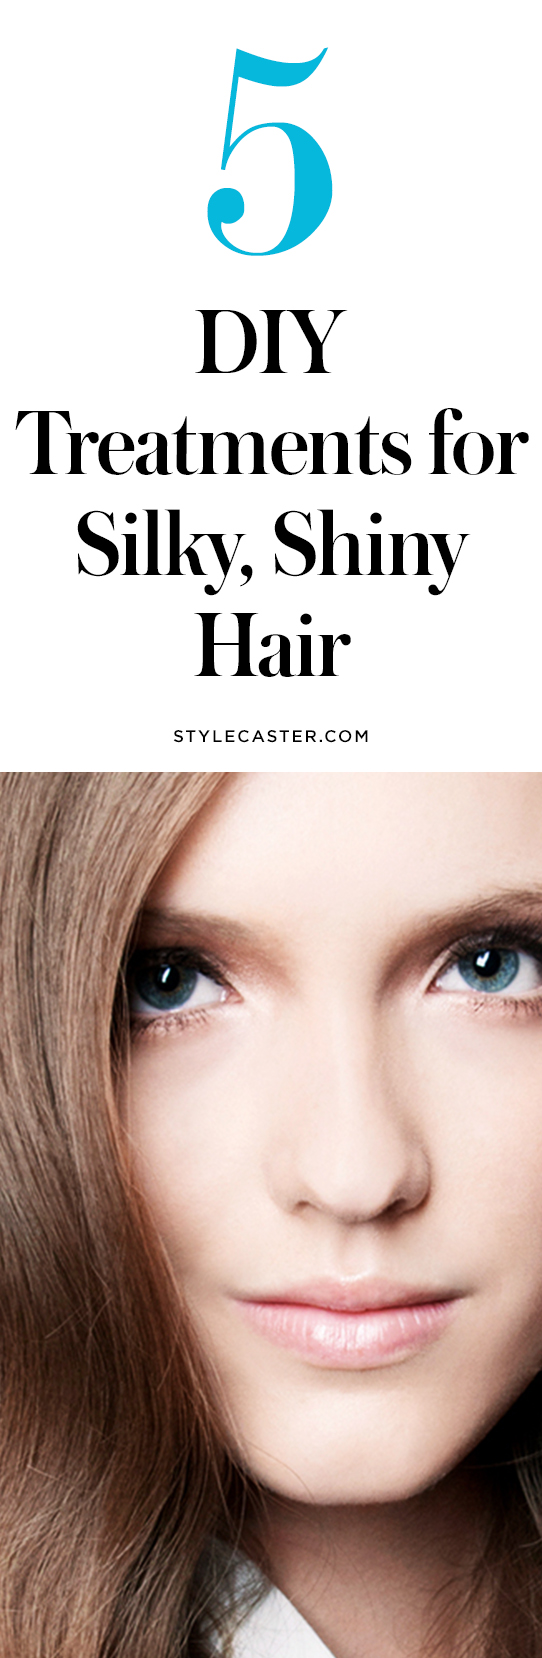 5 DIY dry hair treatments | @stylecaster